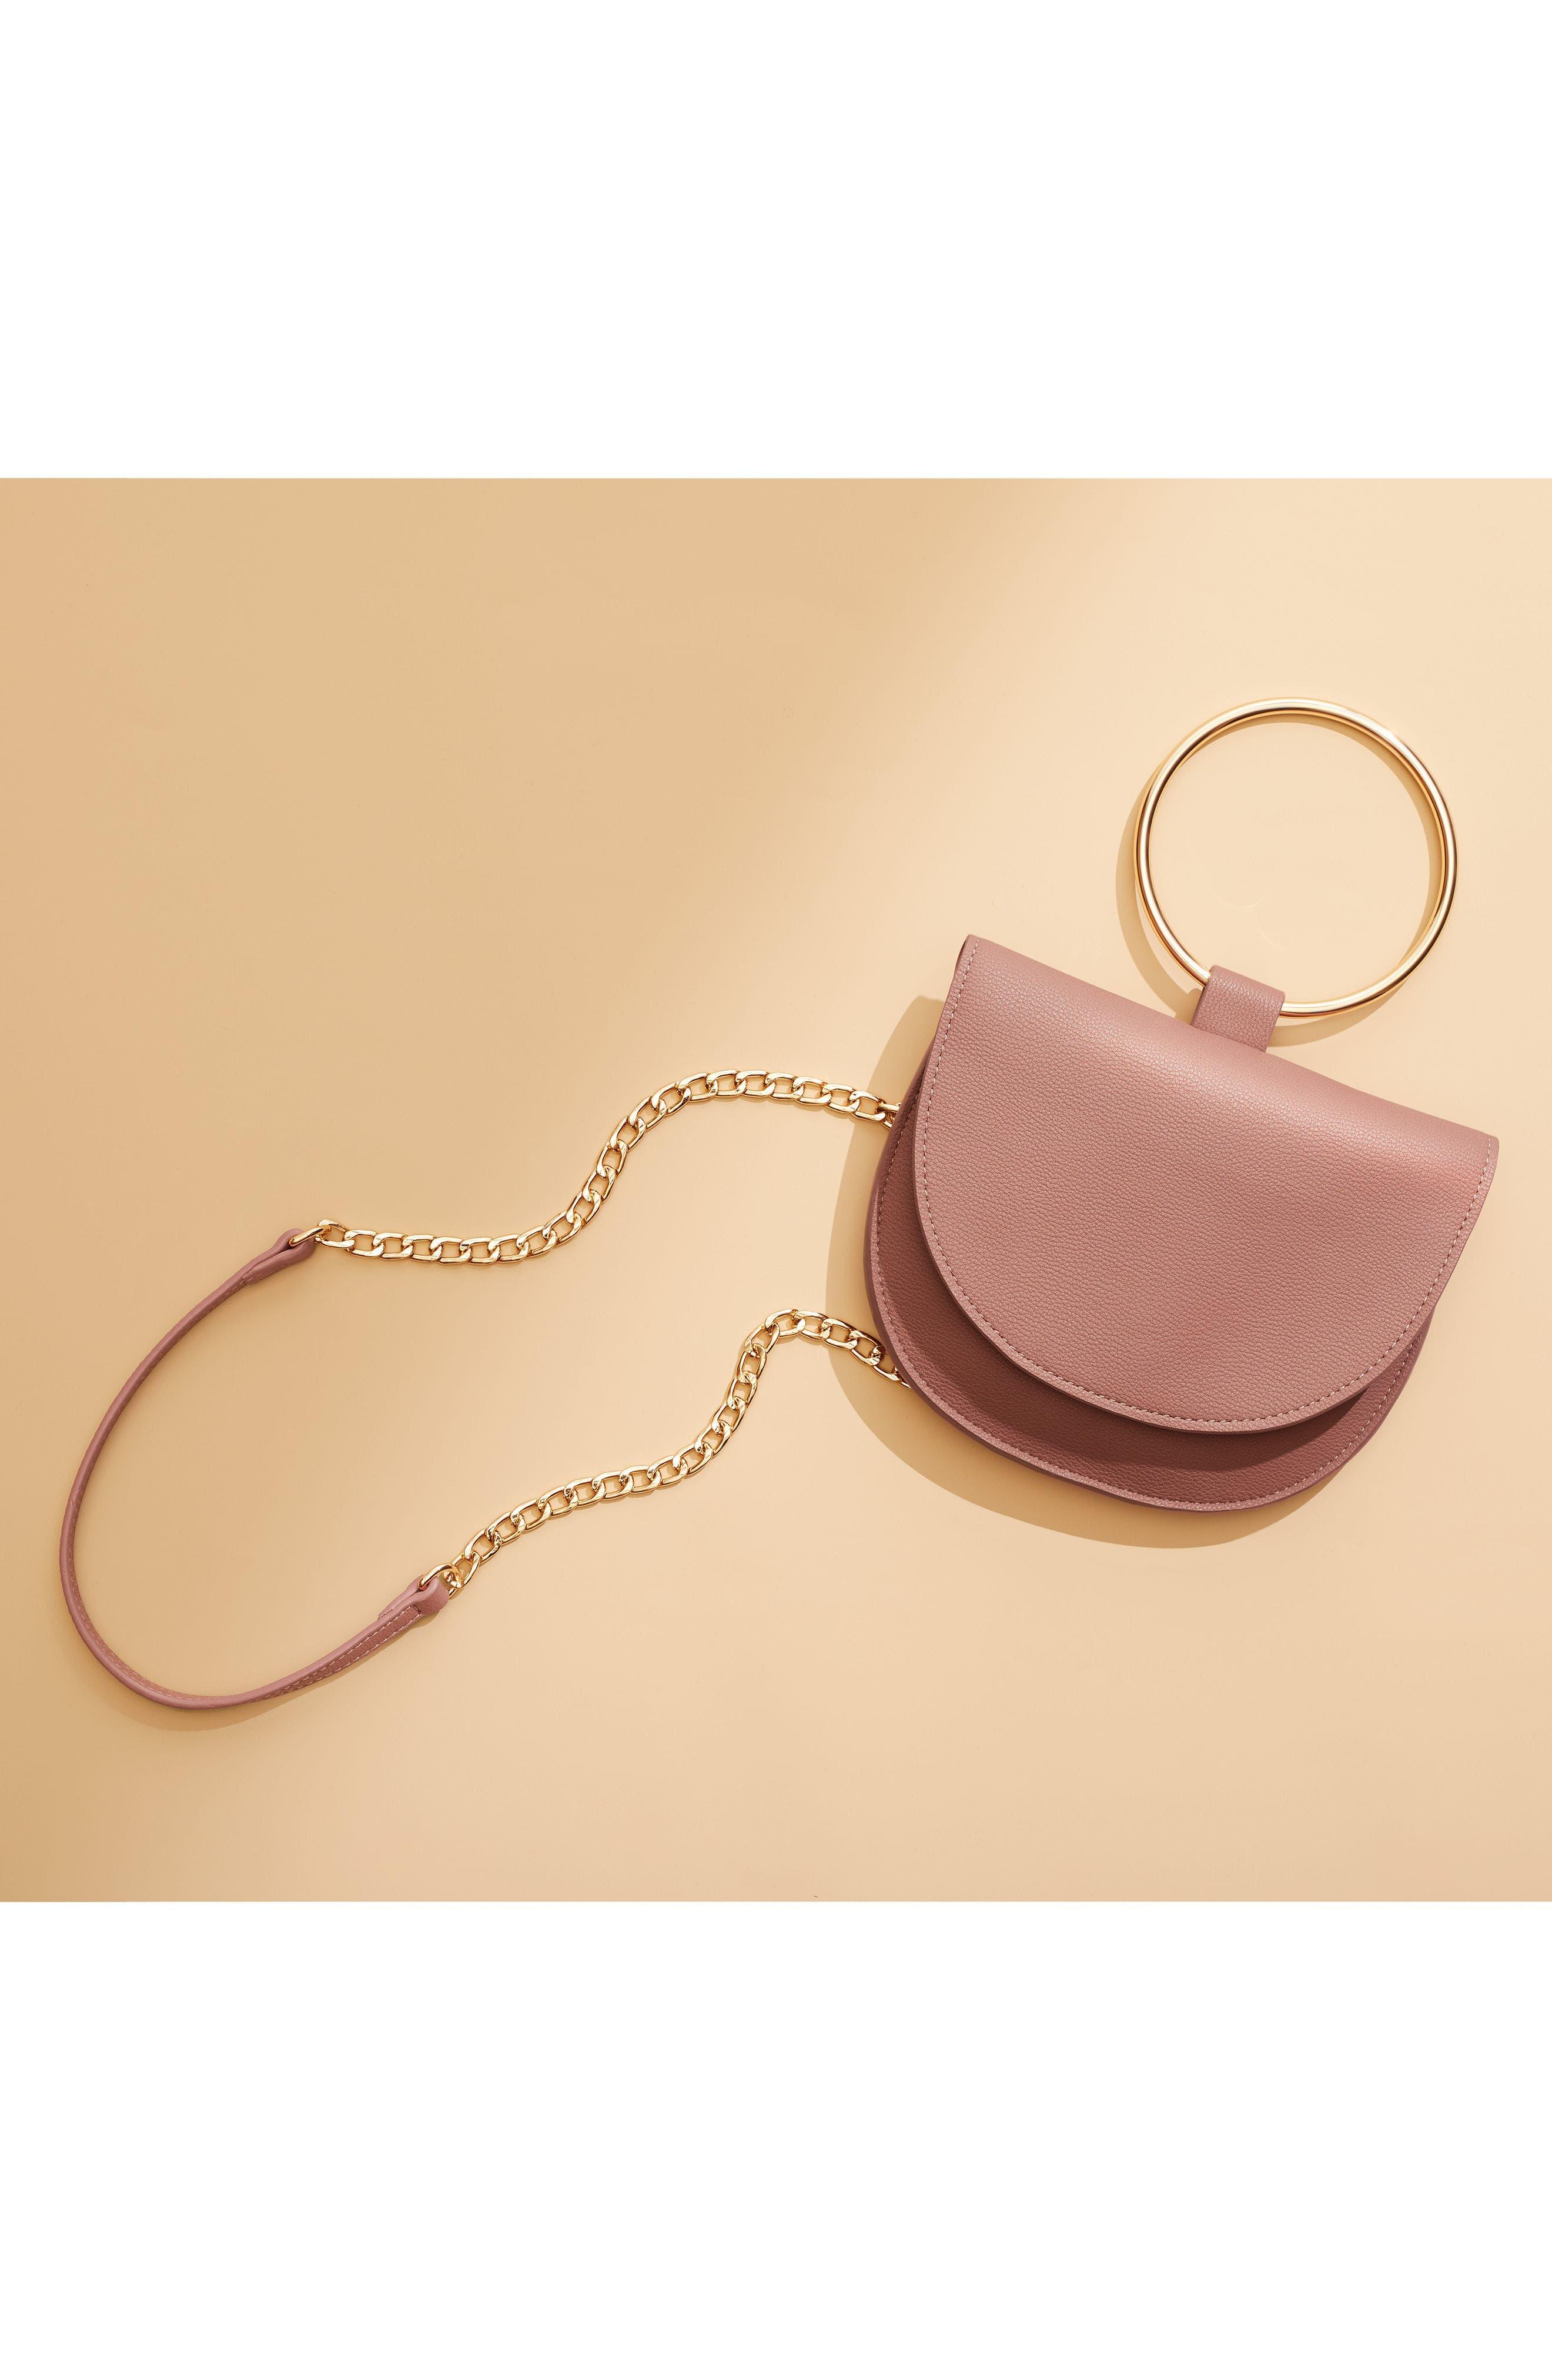 Reese Ring Crossbody Bag,                             Alternate thumbnail 7, color,                             GREY FLINT